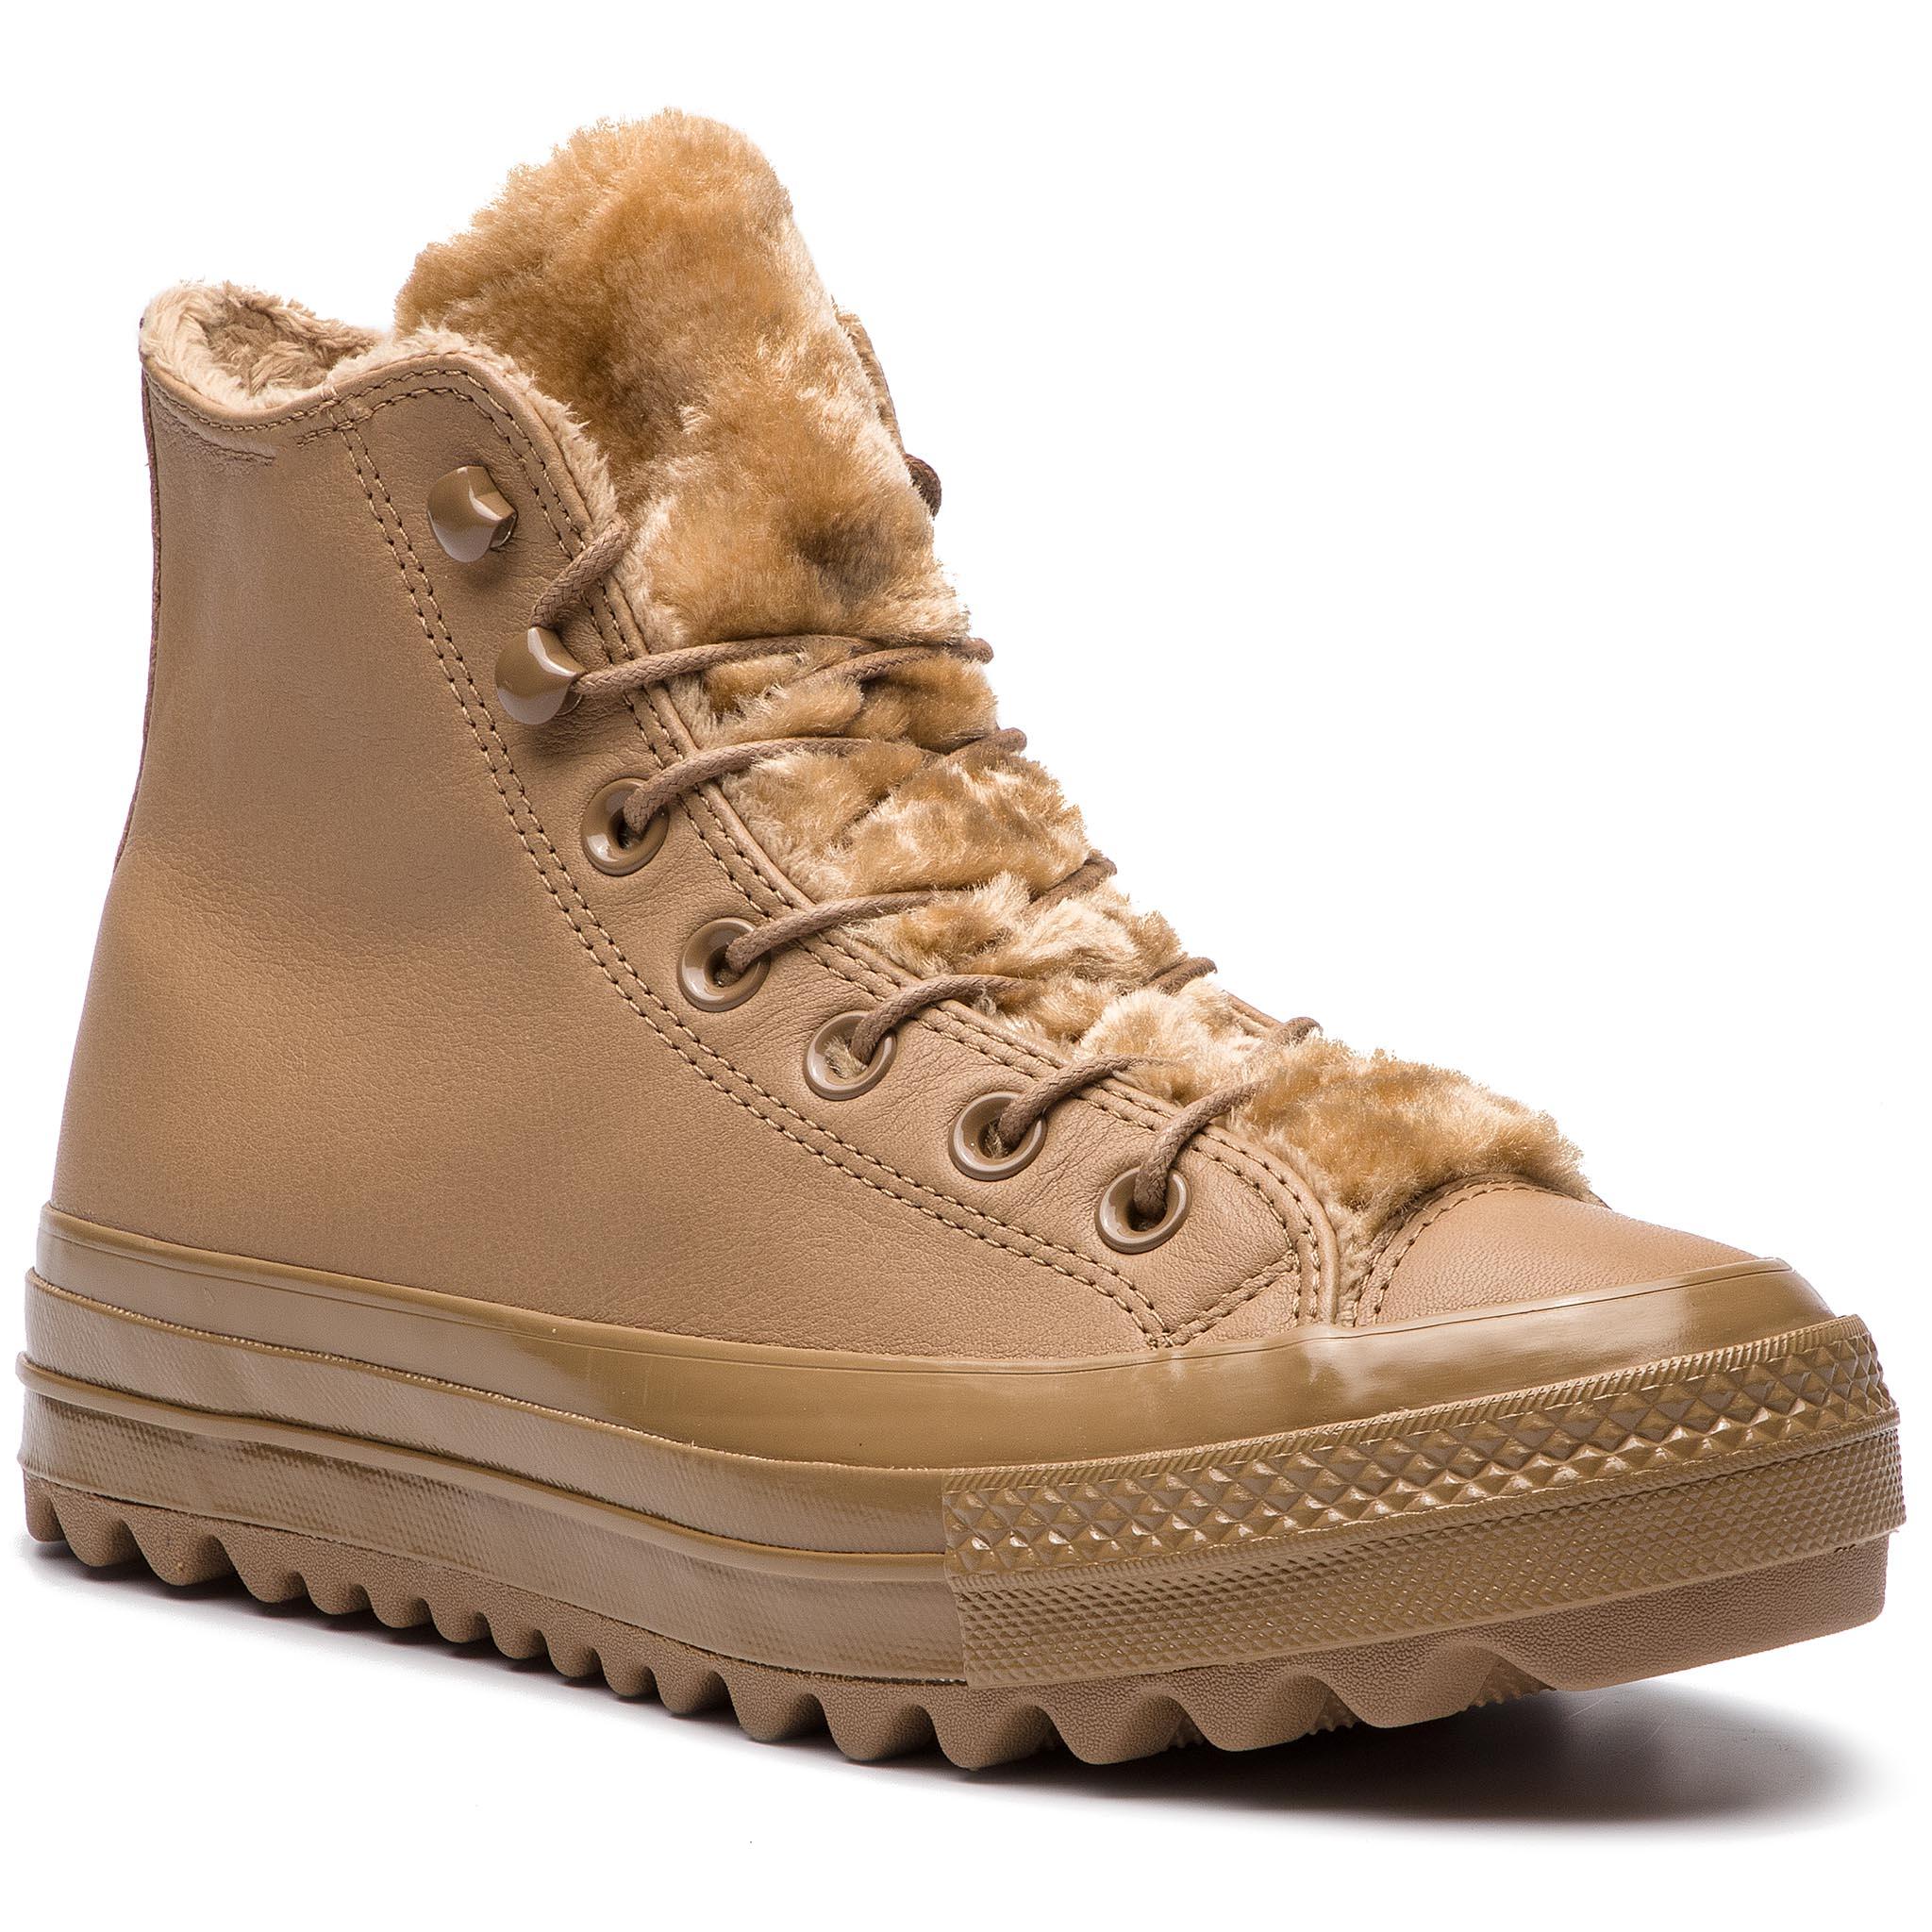 Sneakers CONVERSE Ctas Lift Ripple Hi 562424C TeakTeakTeak